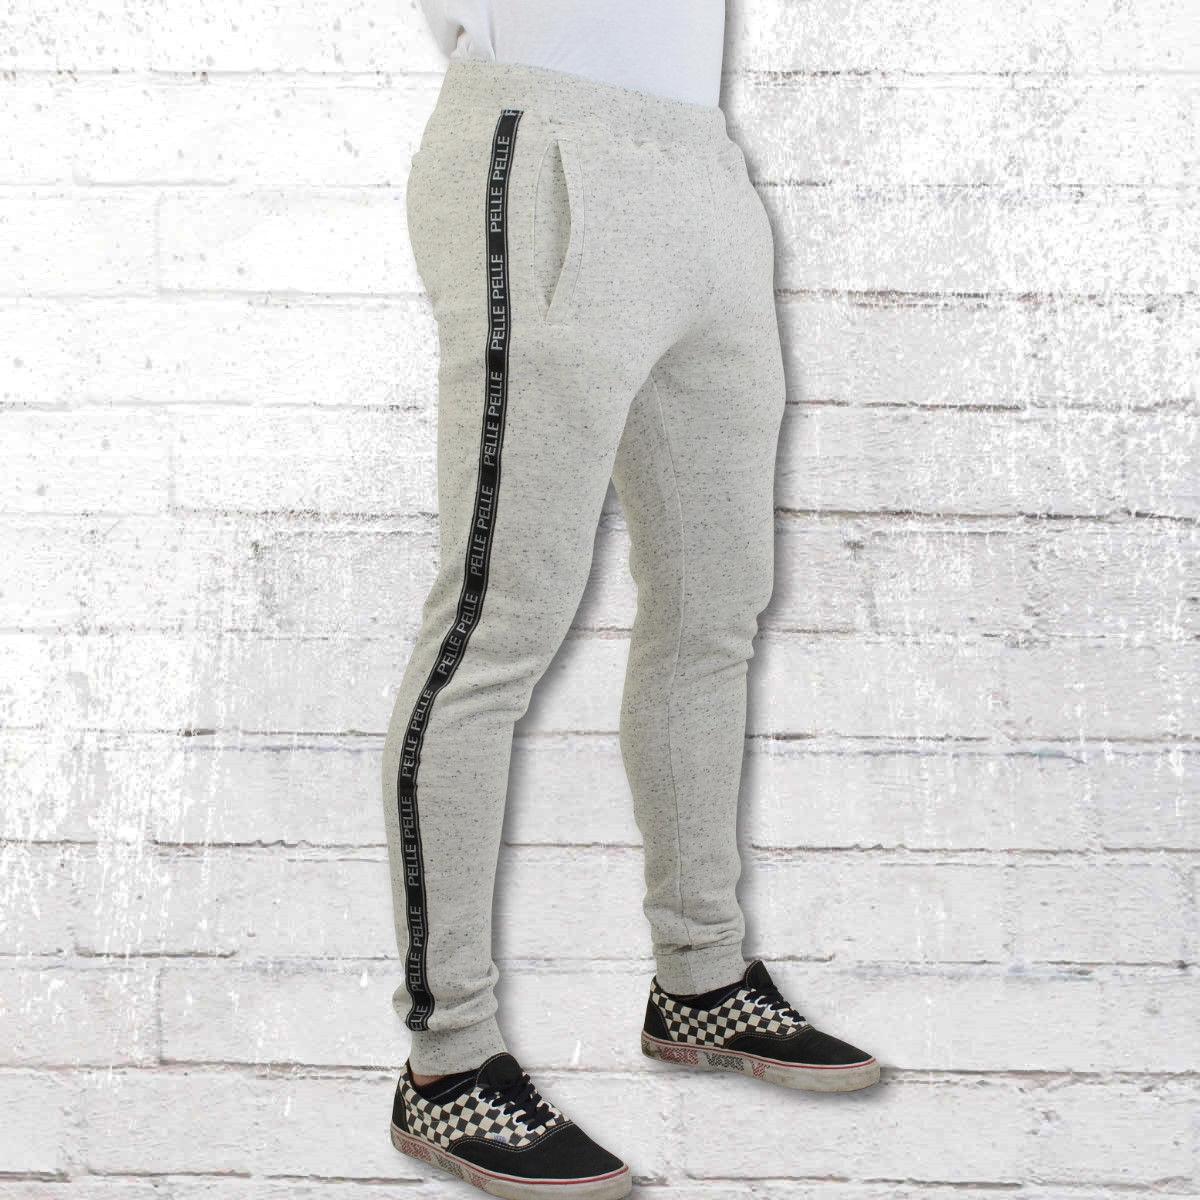 Pelle Pelle Slim Jogging Pantaloni Grigio Tapemasters traningshose SWEAT SWEAT SWEAT PANT UOMO ASH b1653c